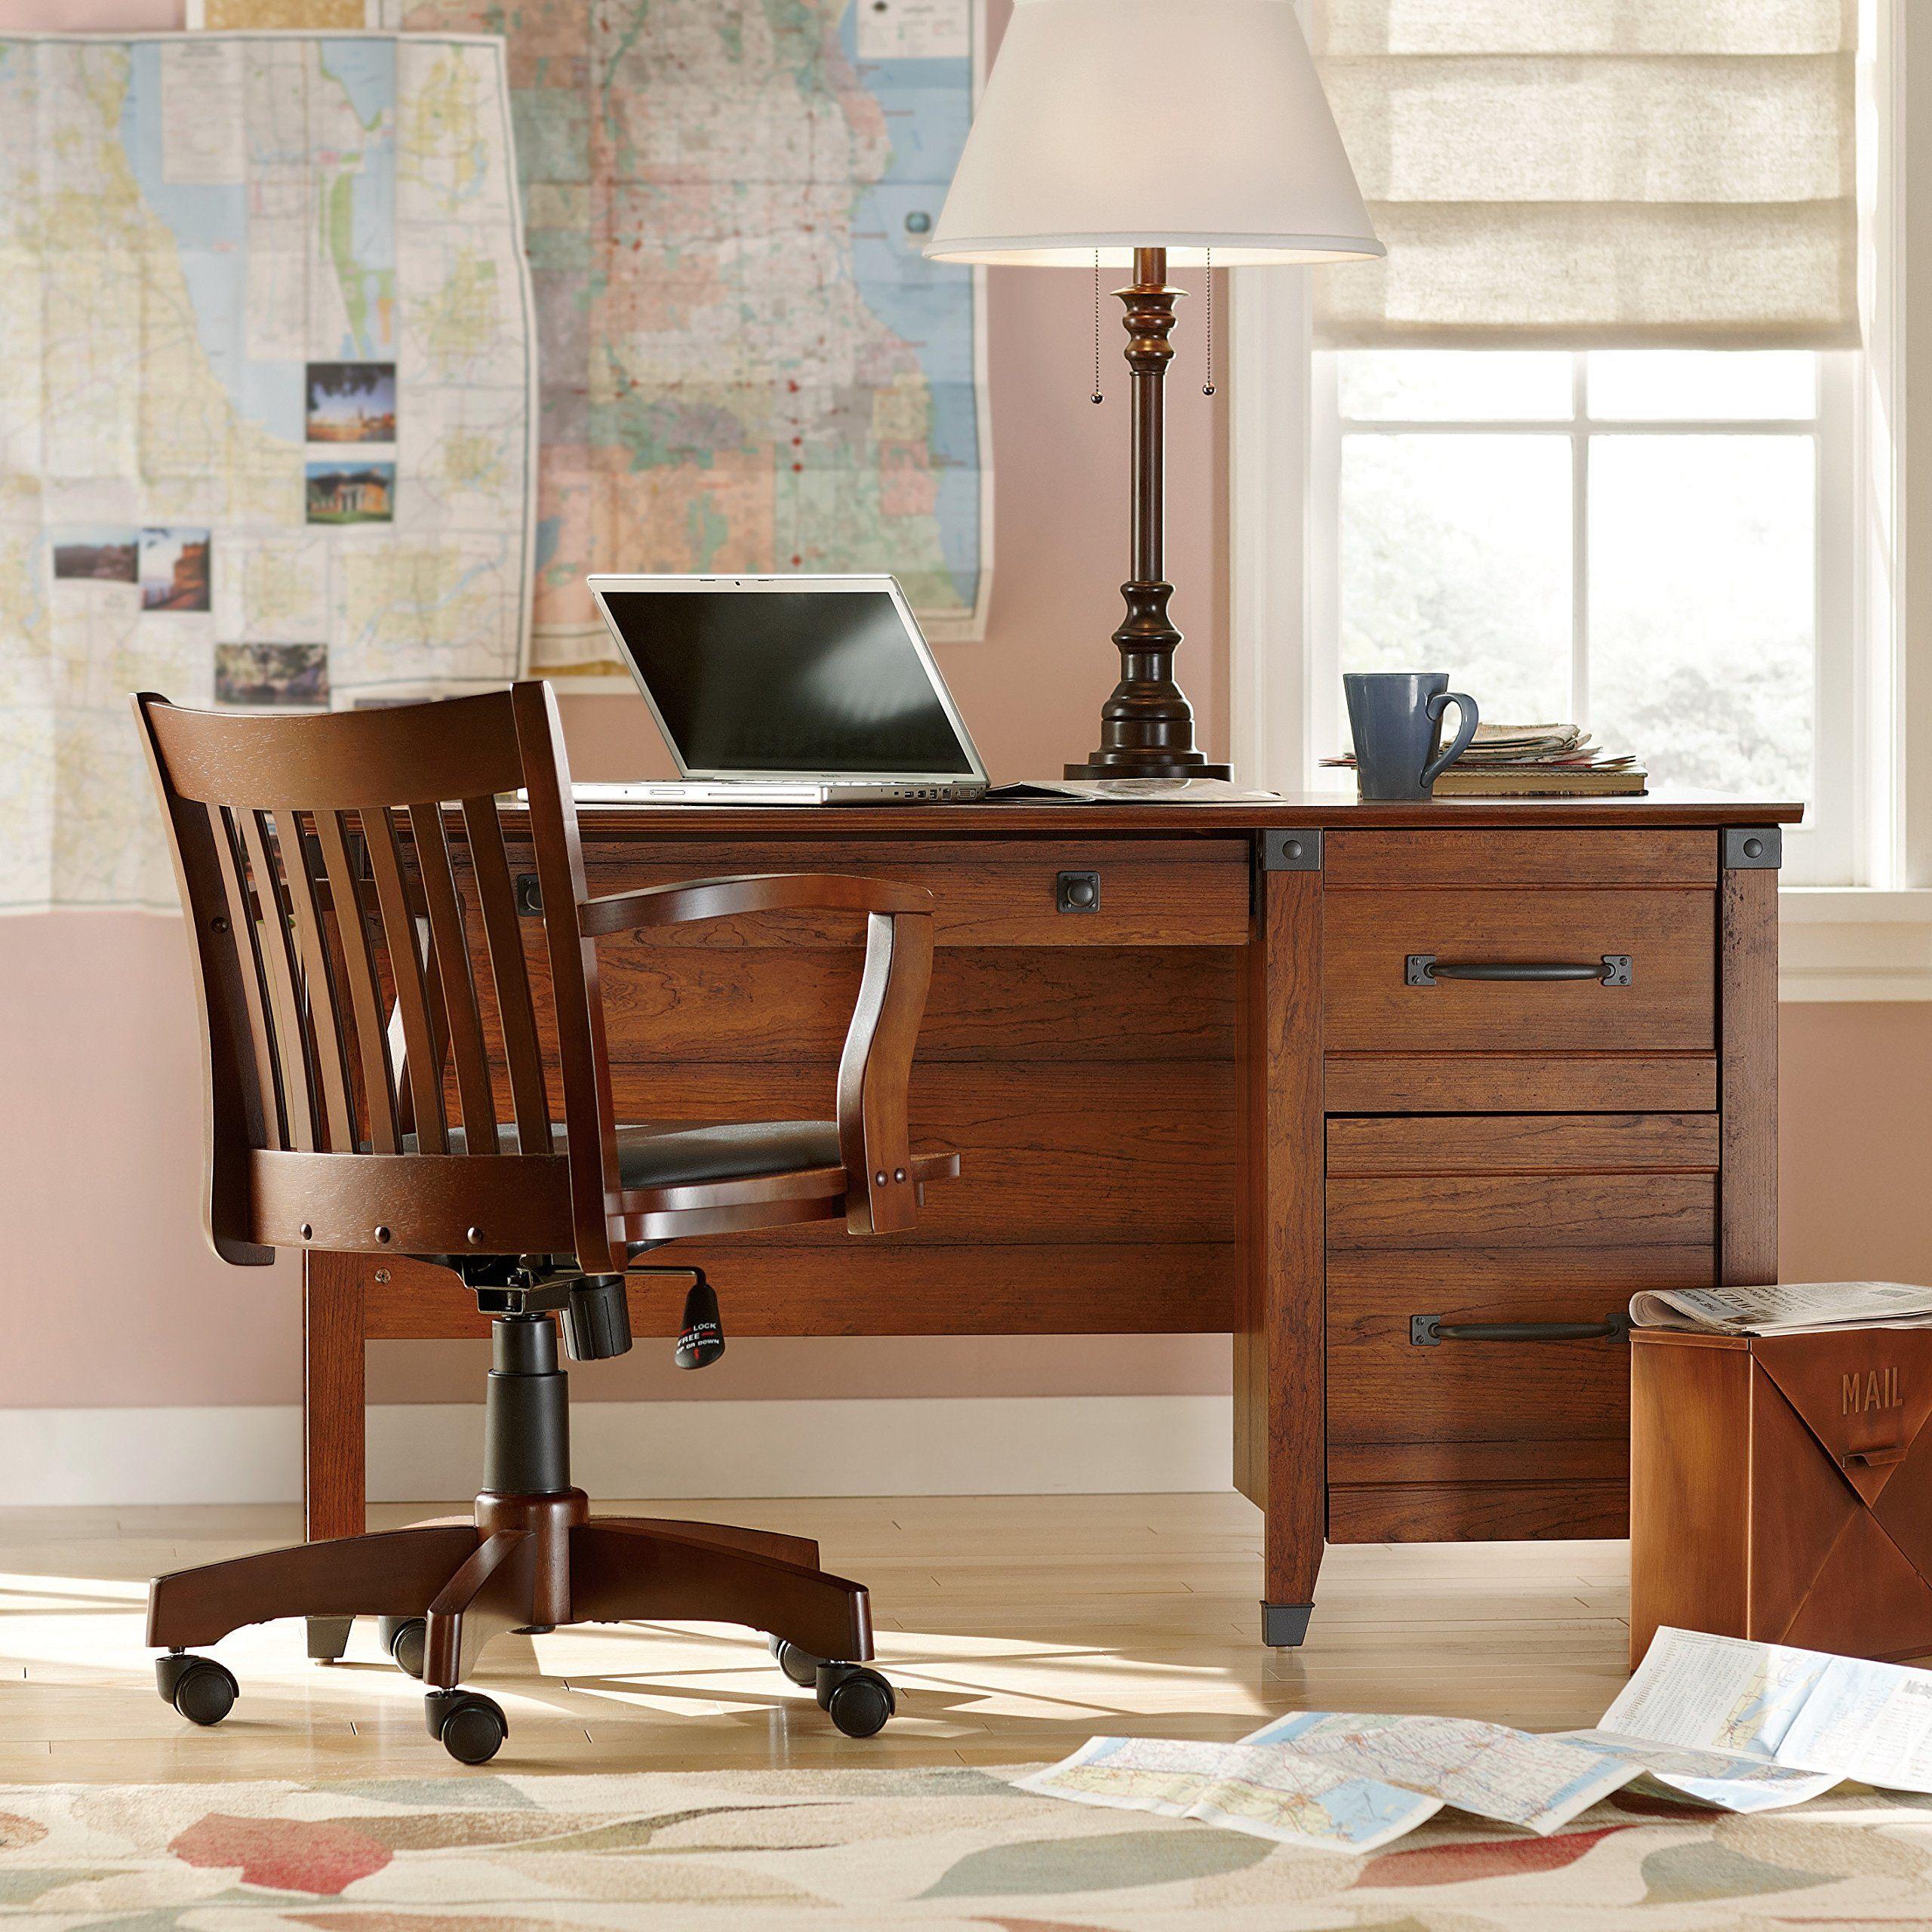 Premium Three Drawer Desk   Elegant Stylish Modern Contemporary Home Office  Furniture Storage Free EBook